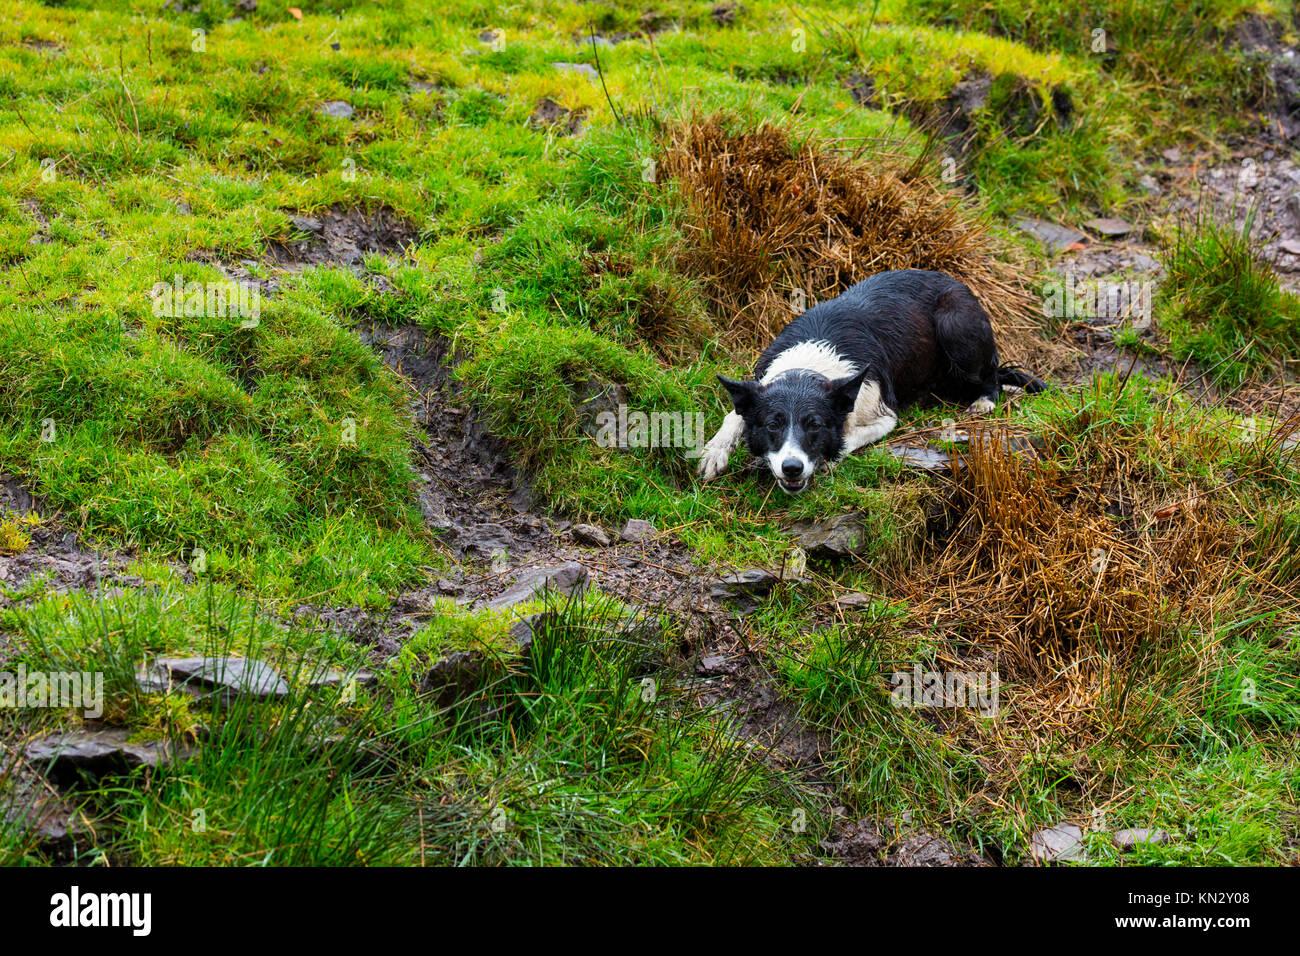 Ireland Sheep Dog Show